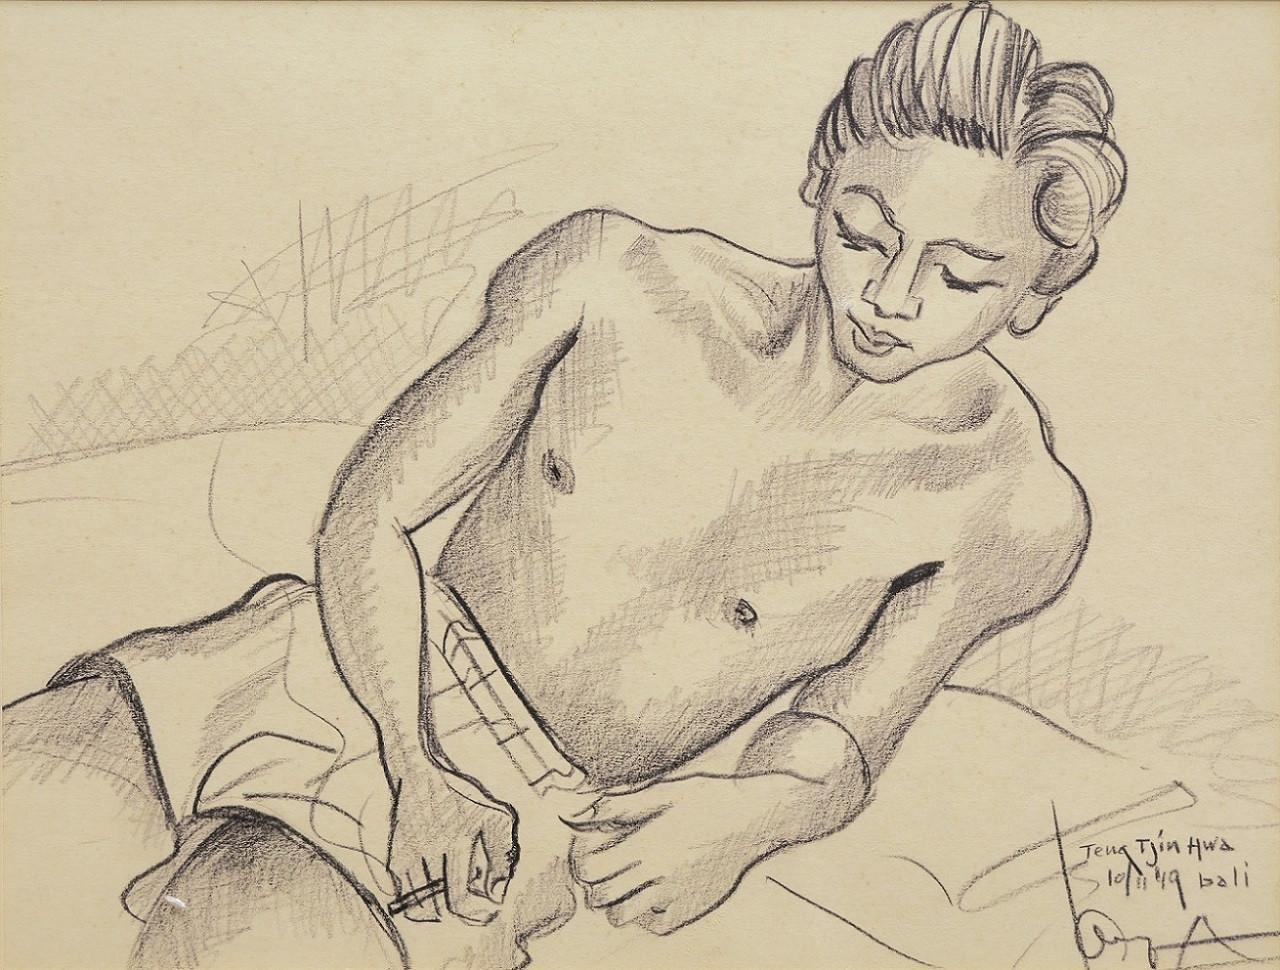 Lot 802 'Teng Tjin Hwa' (1949) by Auke Sonnega. Pencil on paper, 26 x 35 cm.